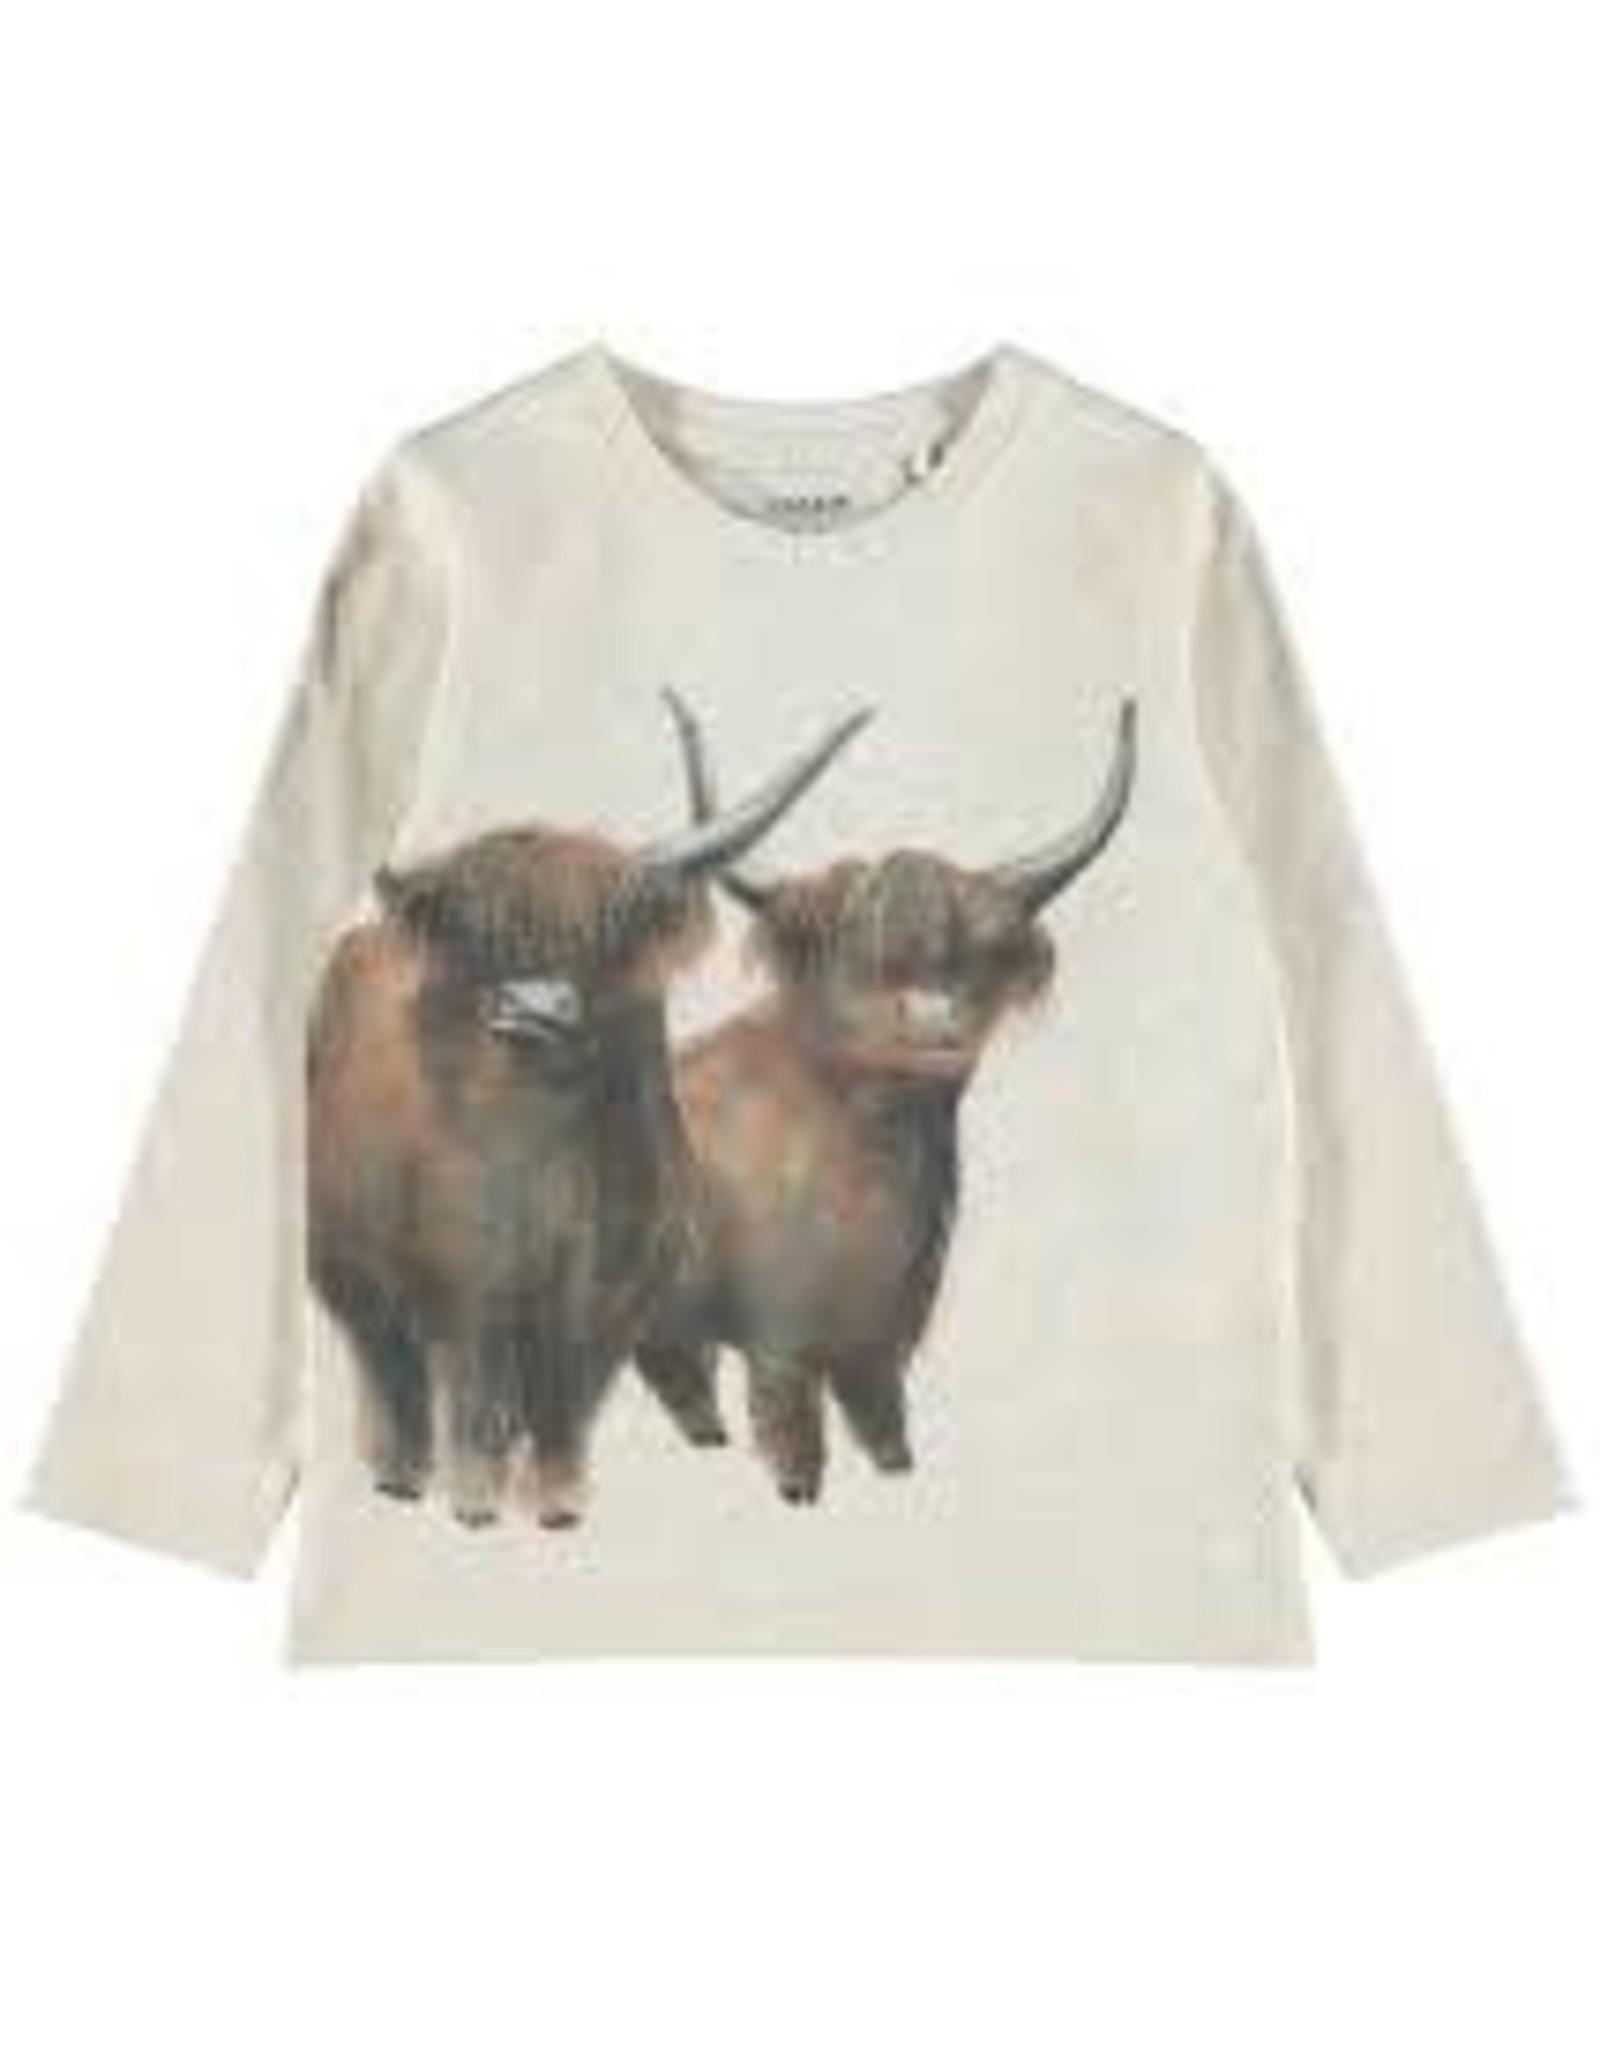 Name It Witte t-shirt met Schotse Highland koeien